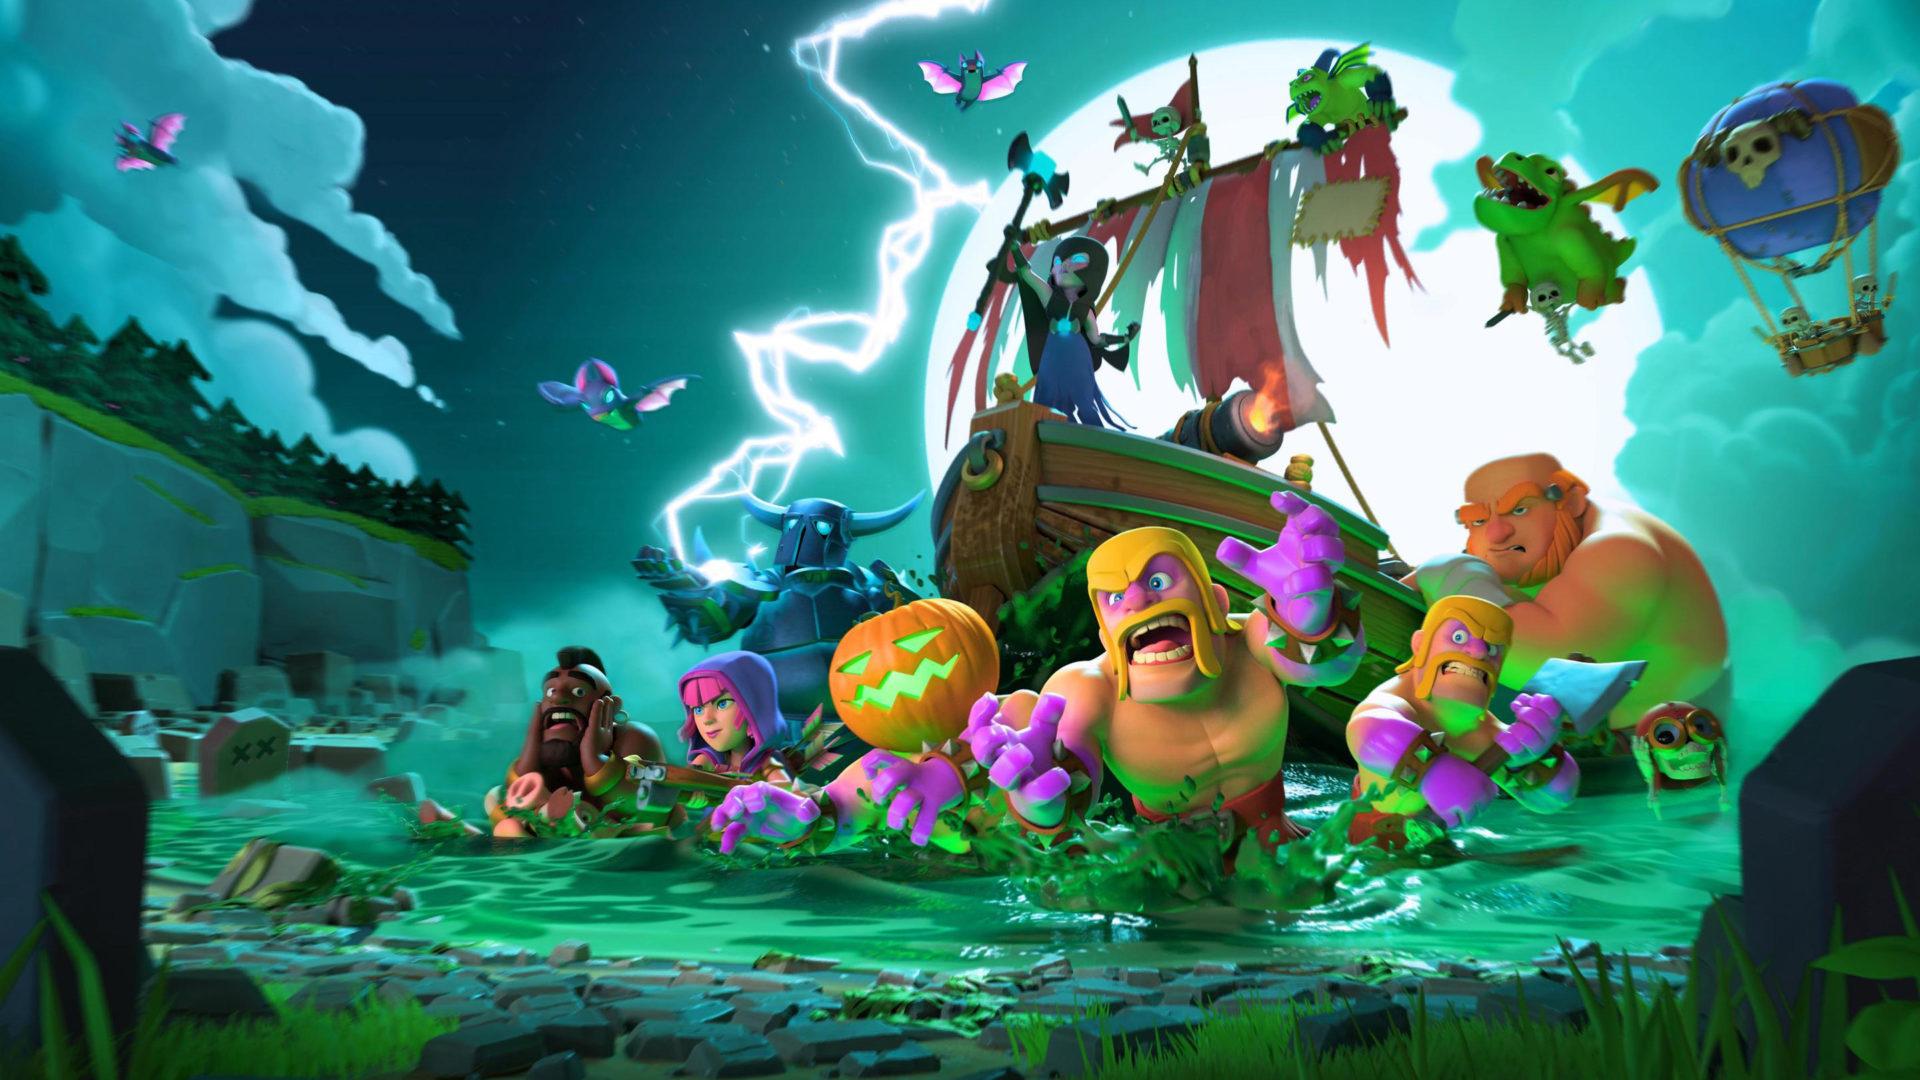 coc wallpaper,adventure game,animated cartoon,illustration,organism,screenshot